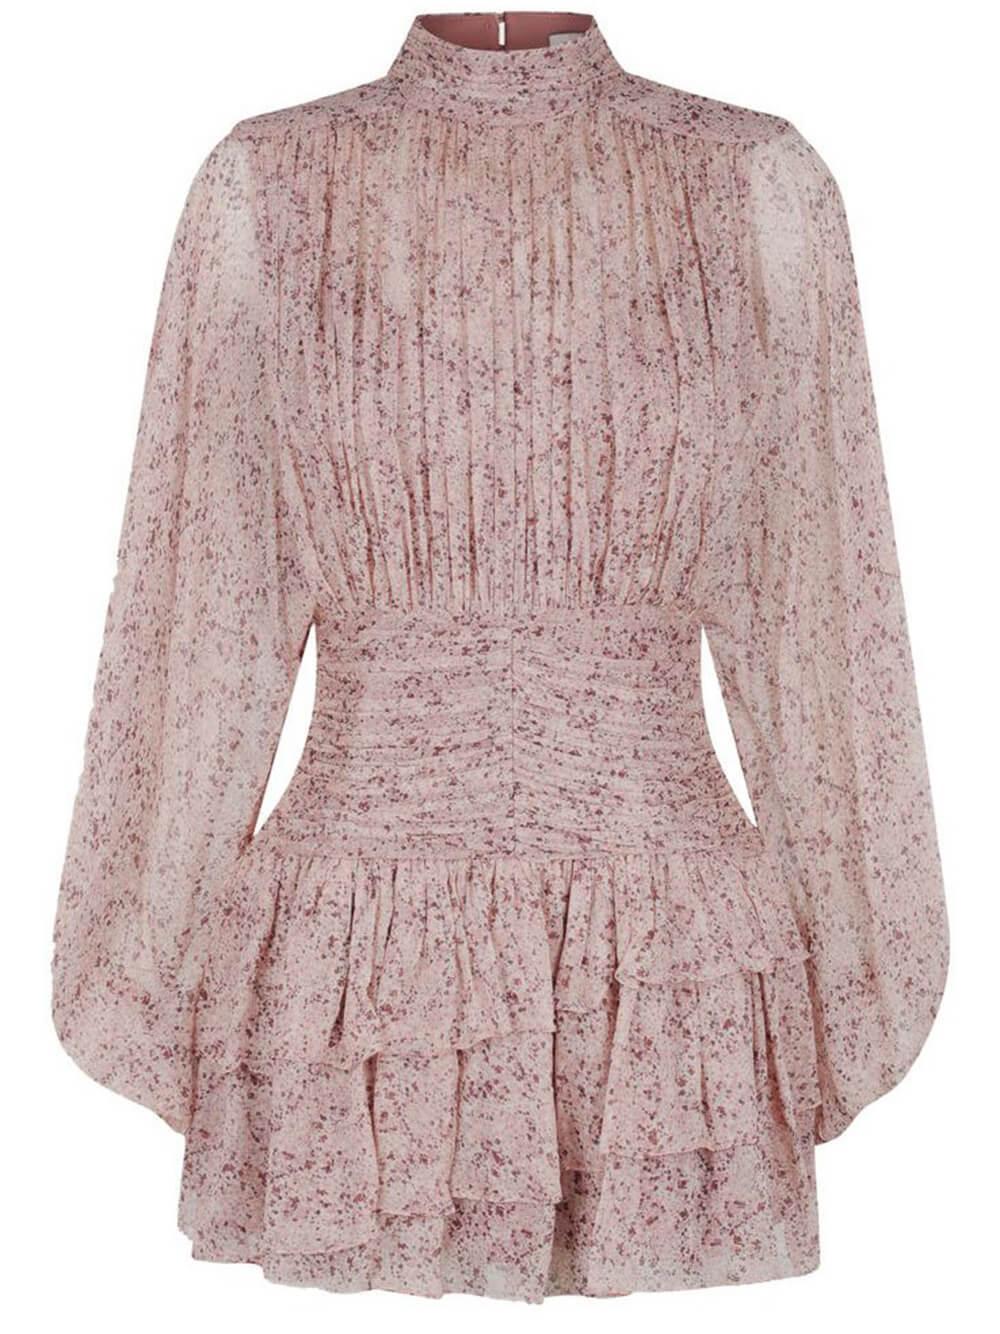 Paulette Ruched Mini Dress Item # 213059